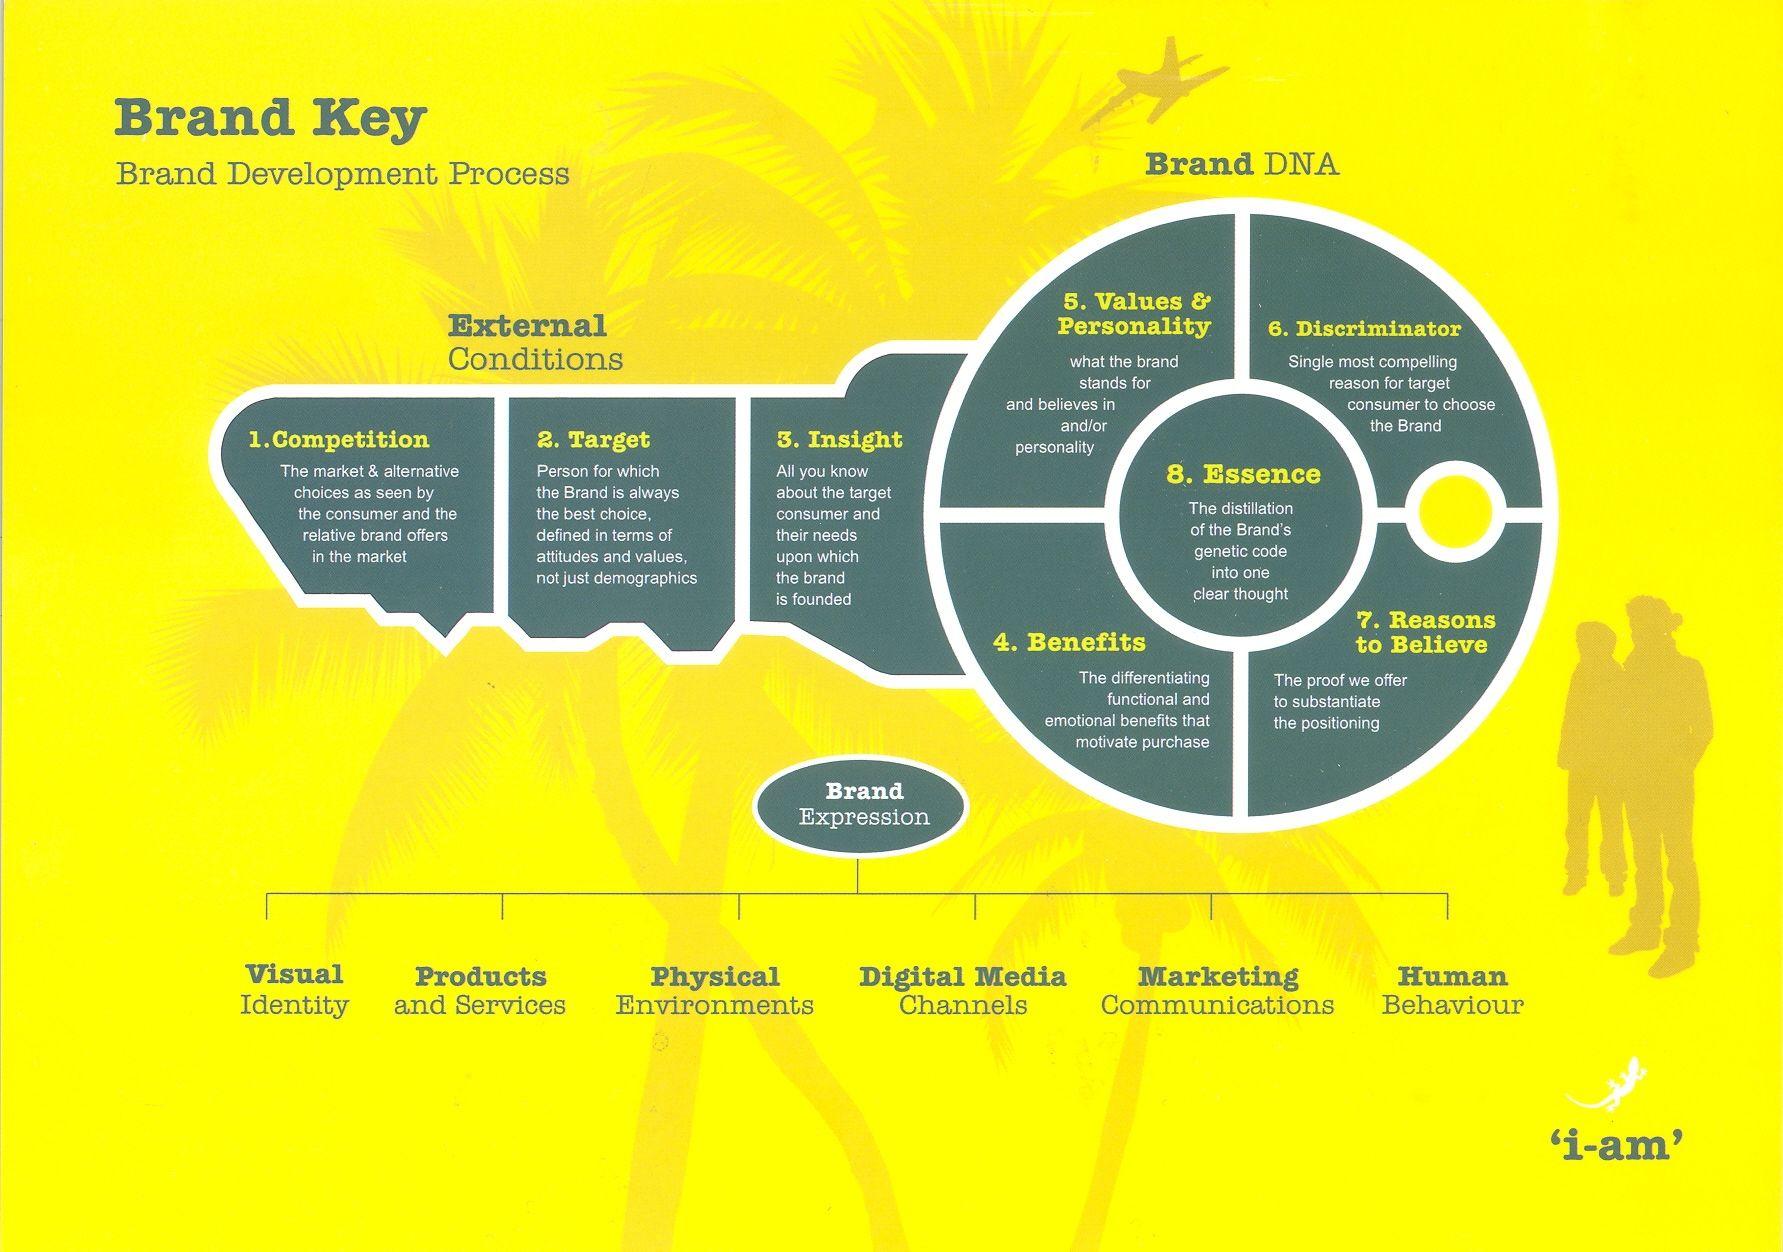 brand development strategy brand development agencies brand development consultant brand creation and development 4 brand development strategies